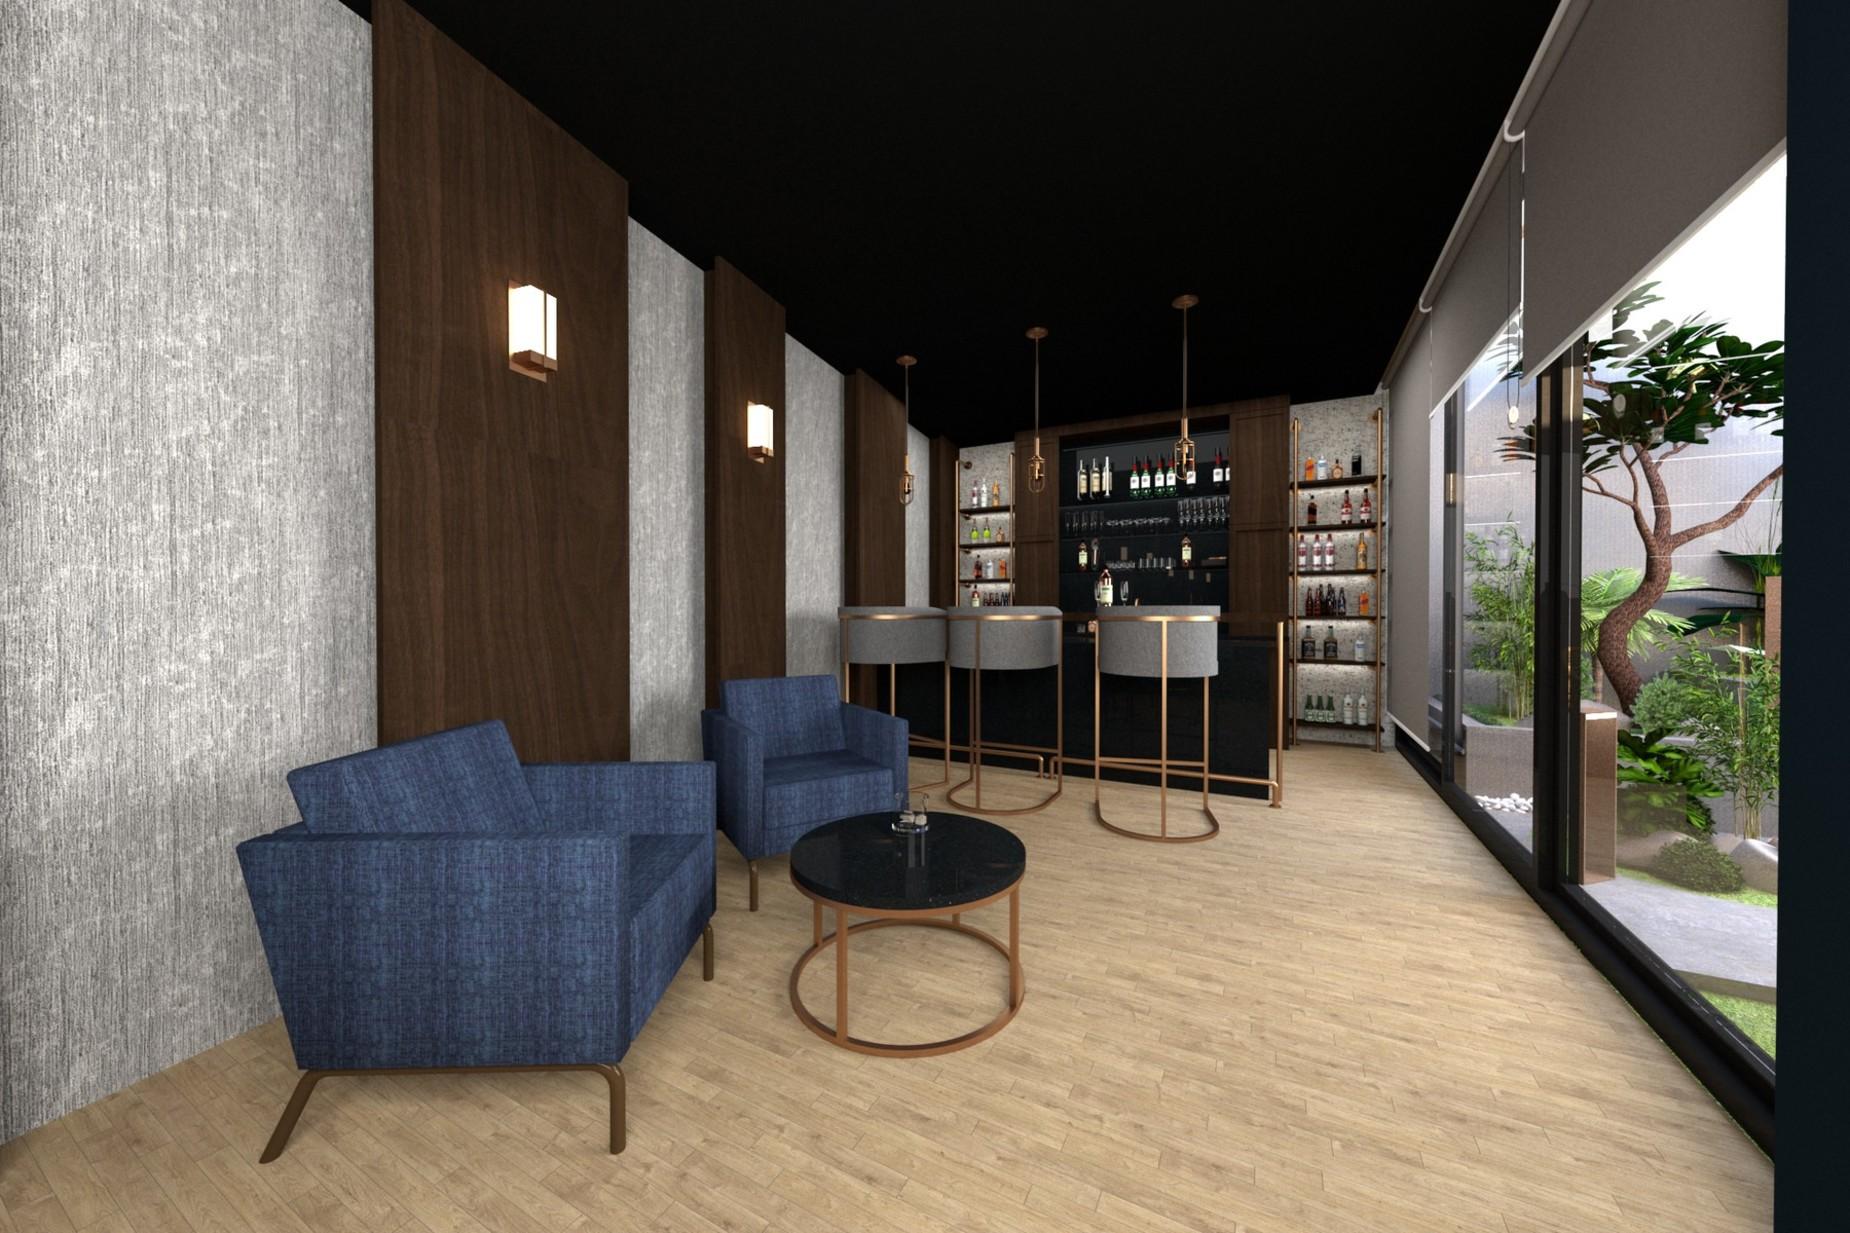 4 bed Villa For Sale in Mellieha, Mellieha - thumb 10